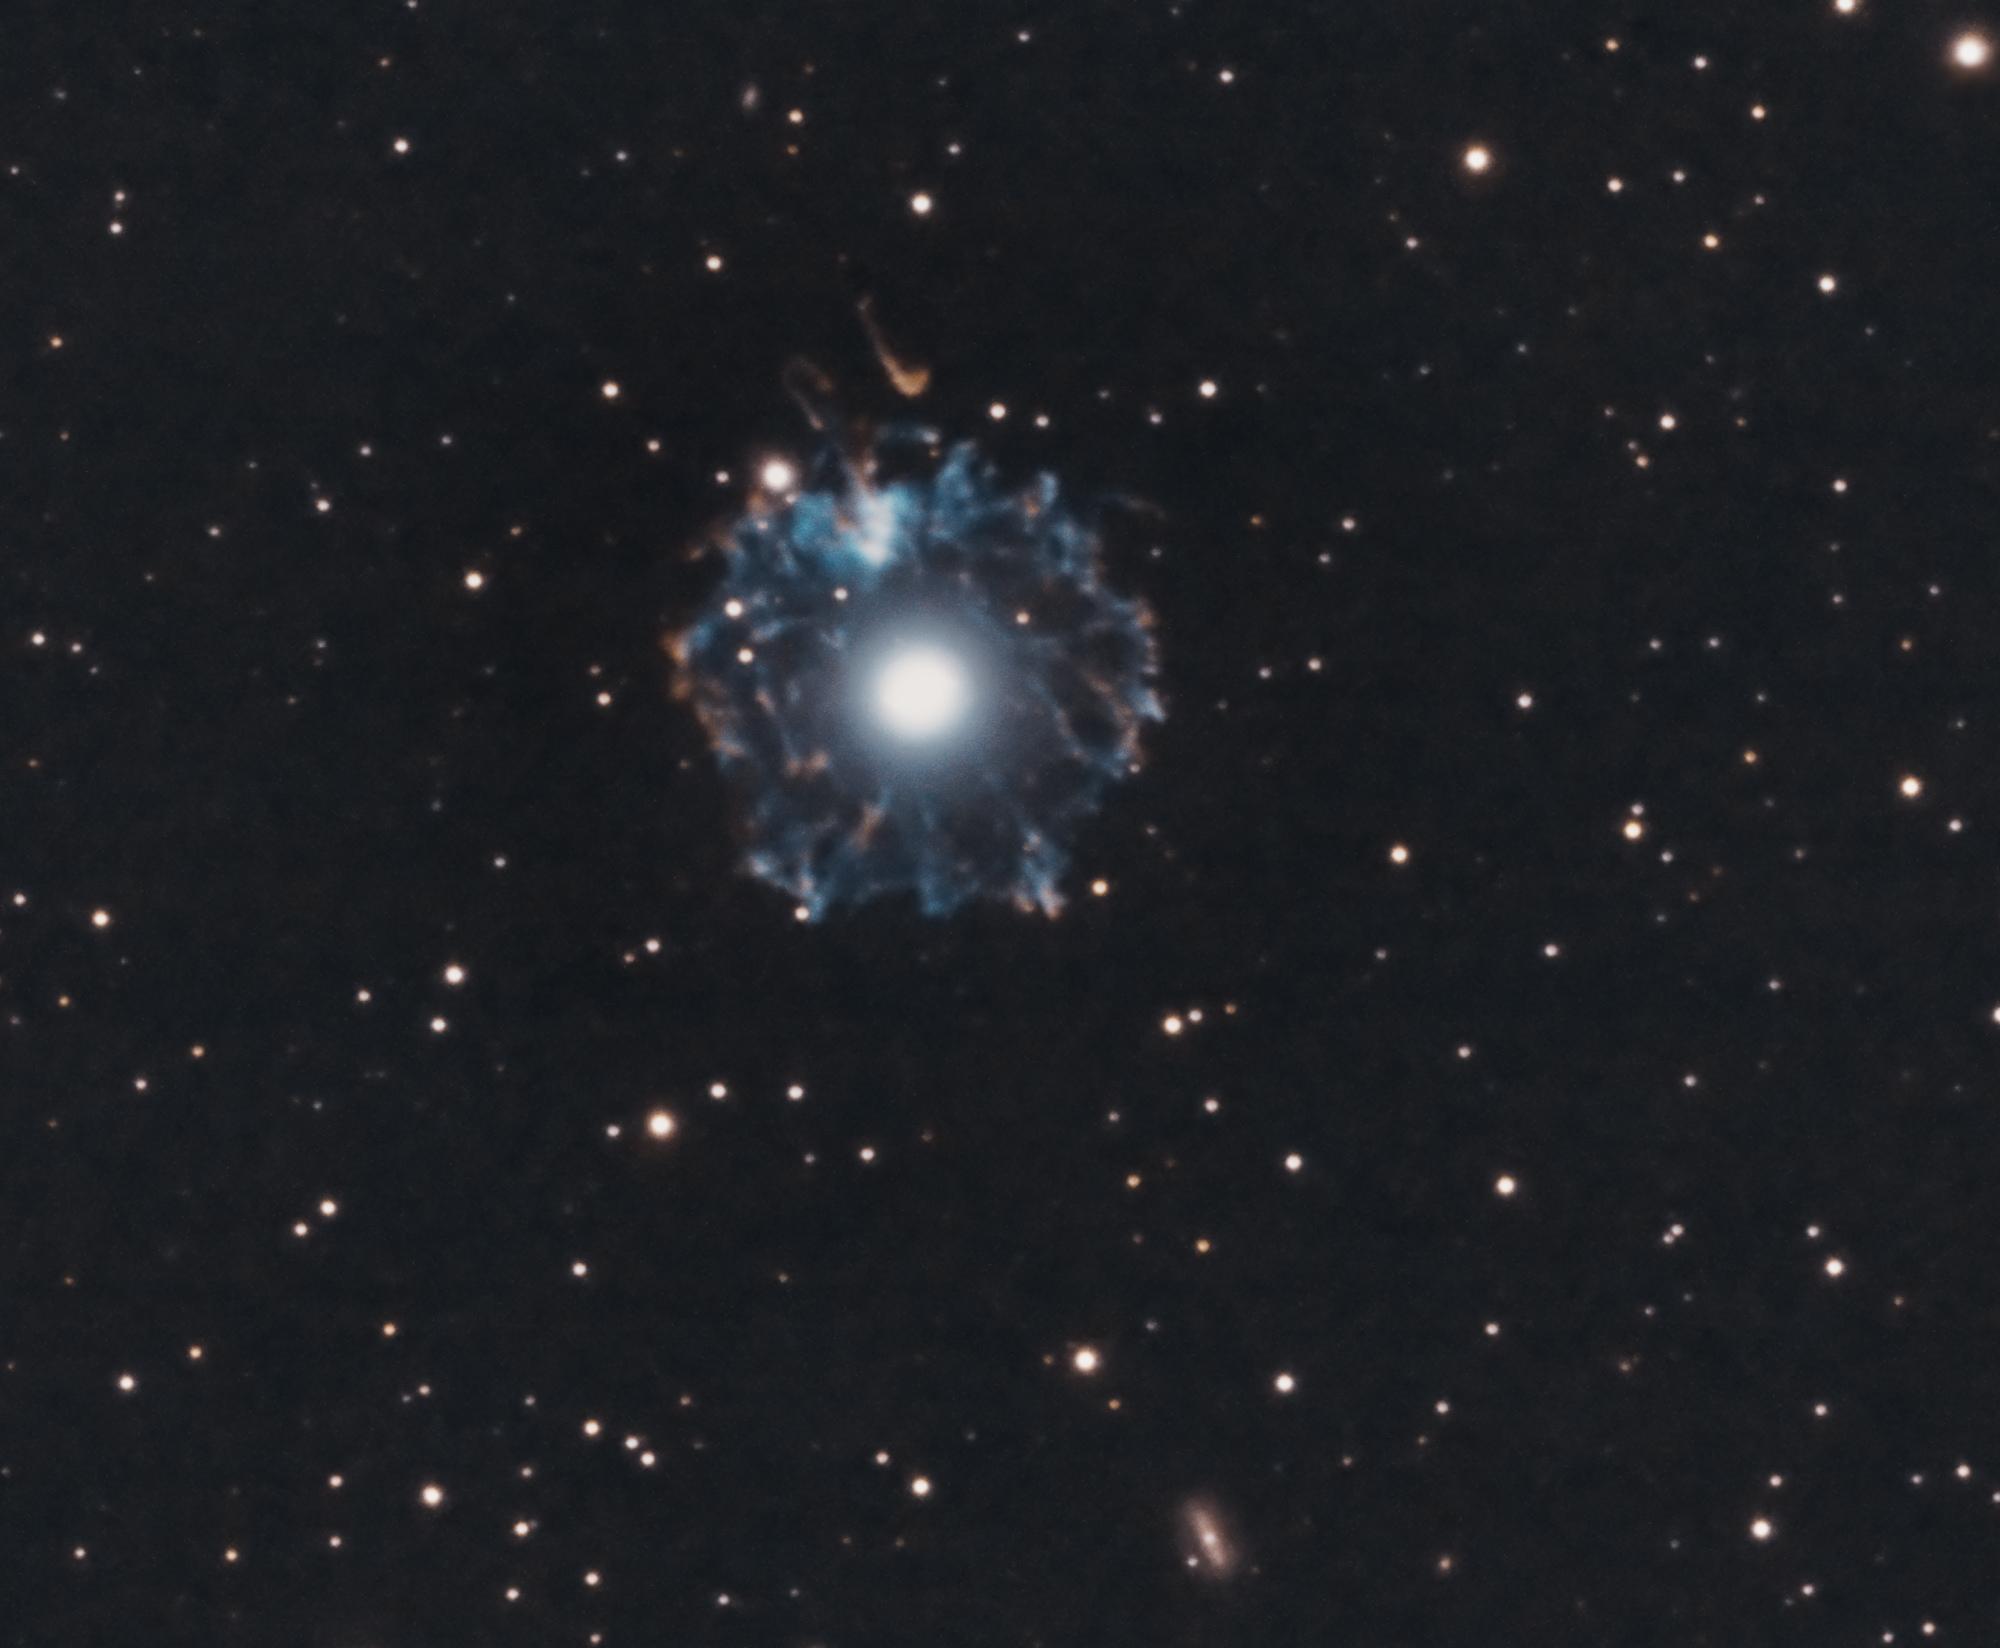 NGC6543_SHO_bicolor_ac_web_crop.jpg